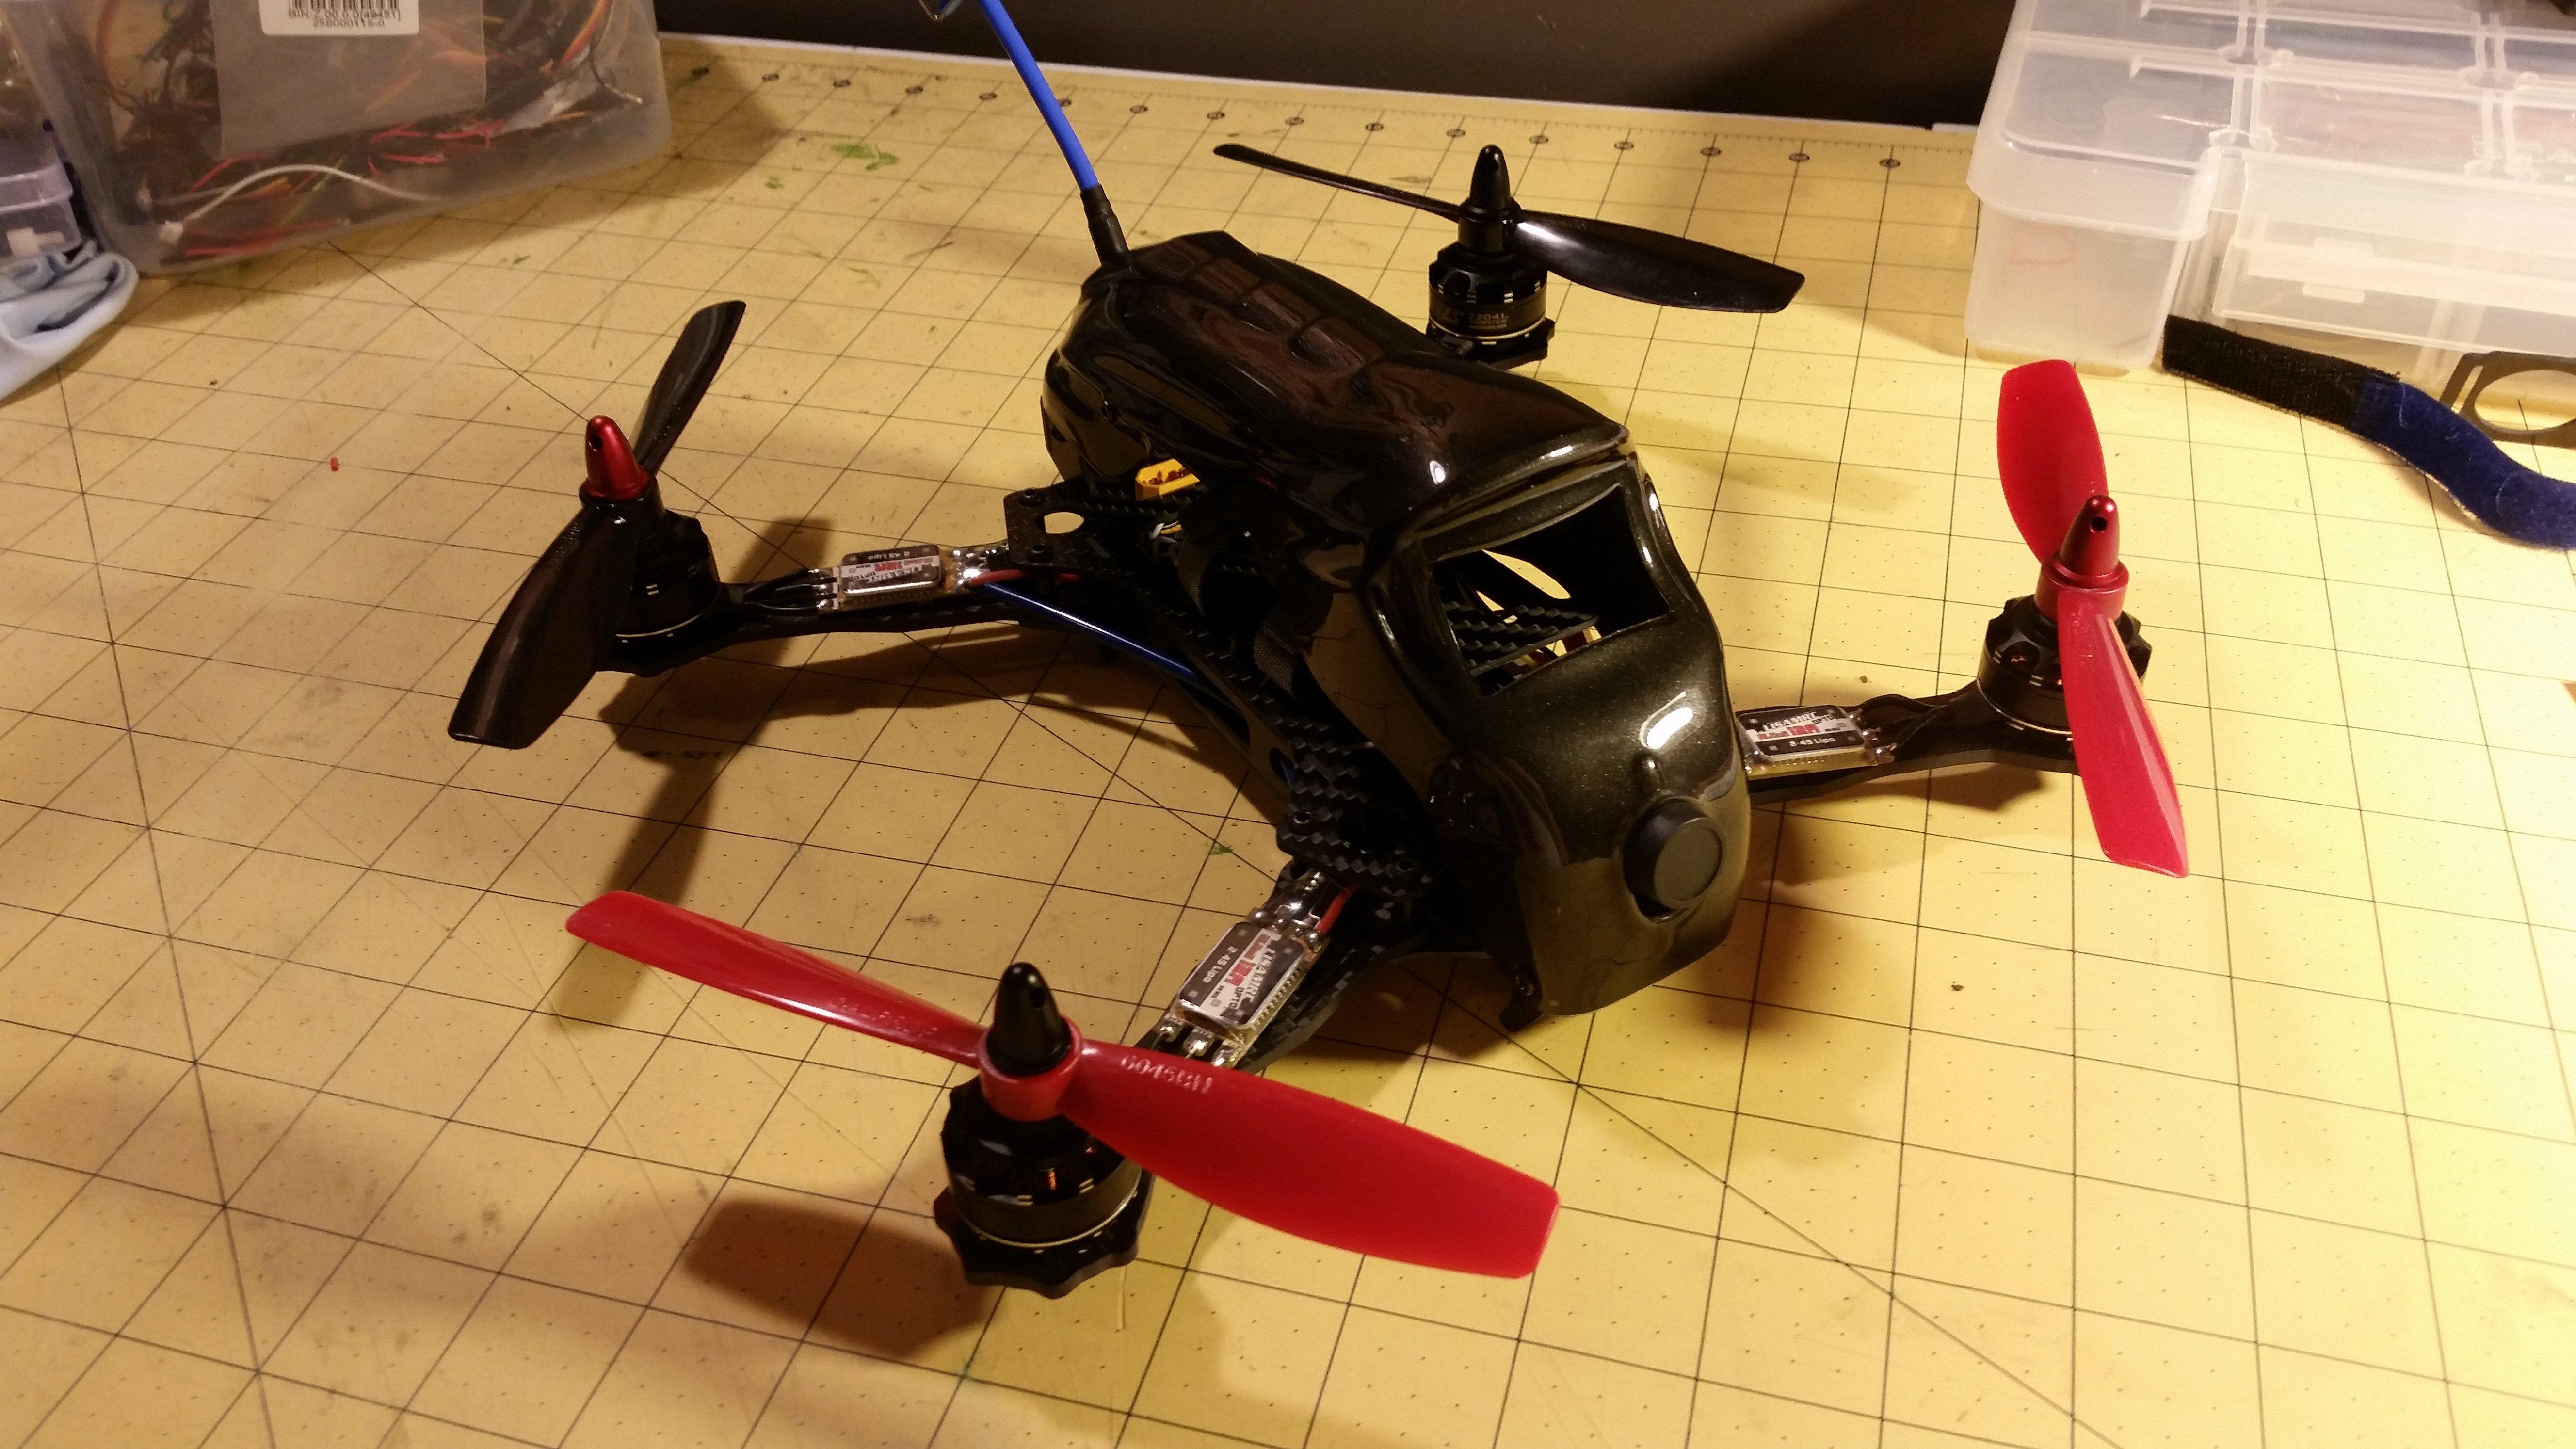 REVIEW: Lisam RC Keel-270 ARF | Flite Test